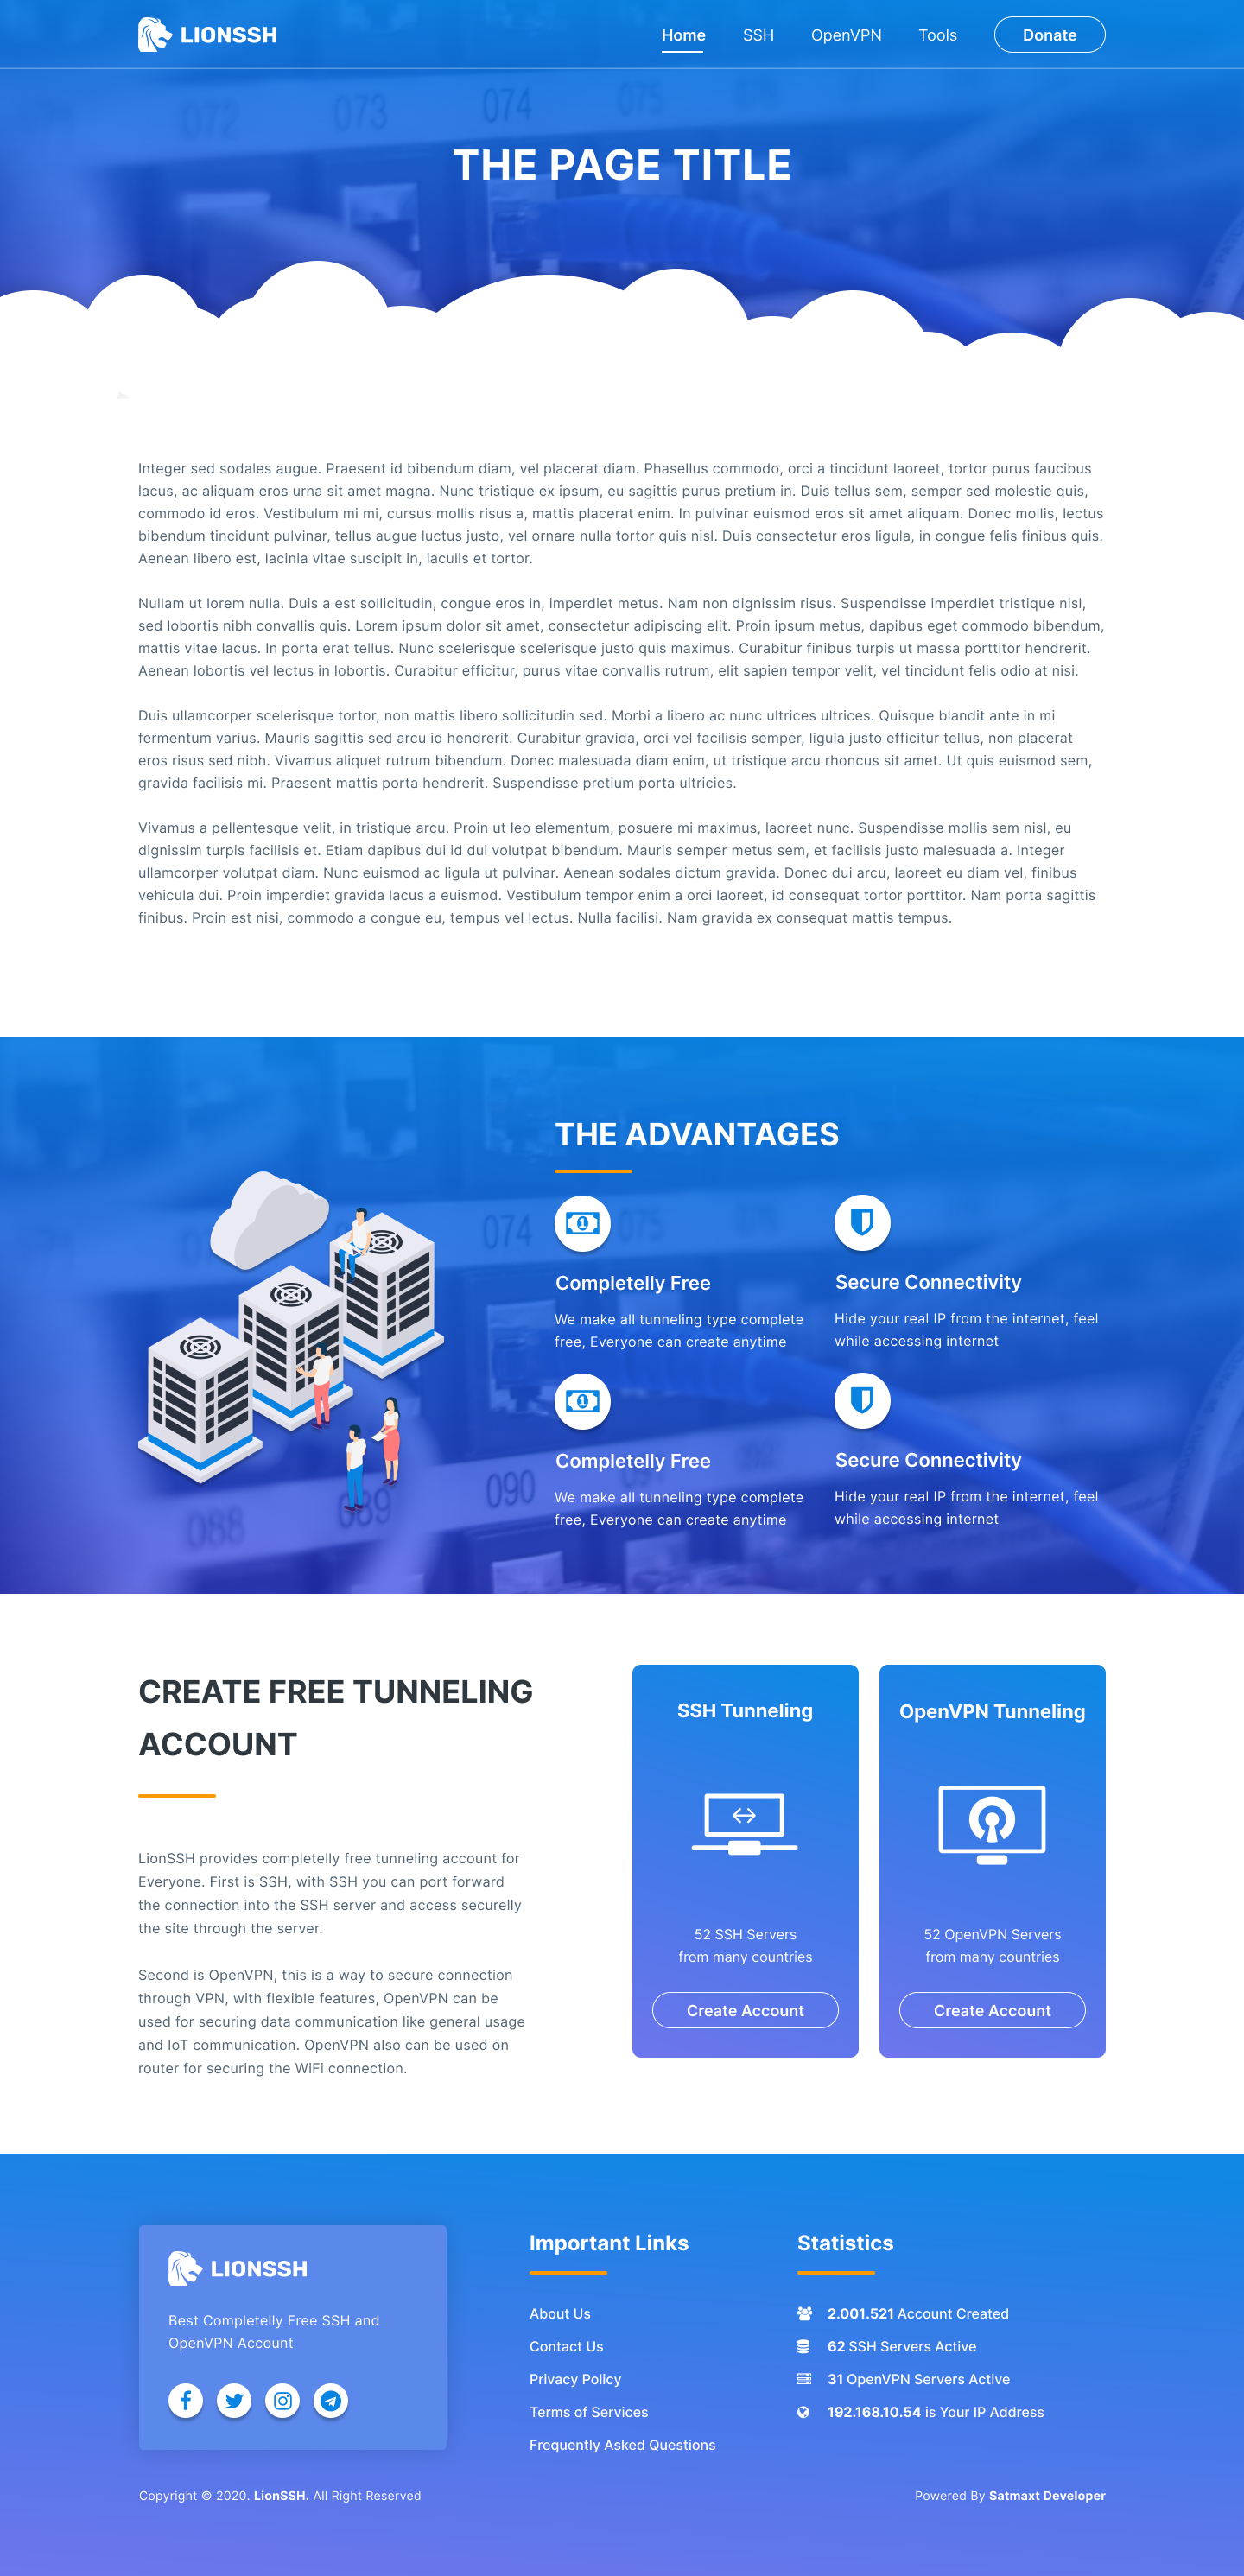 LionSSH - FREE SSH & OPENVPN